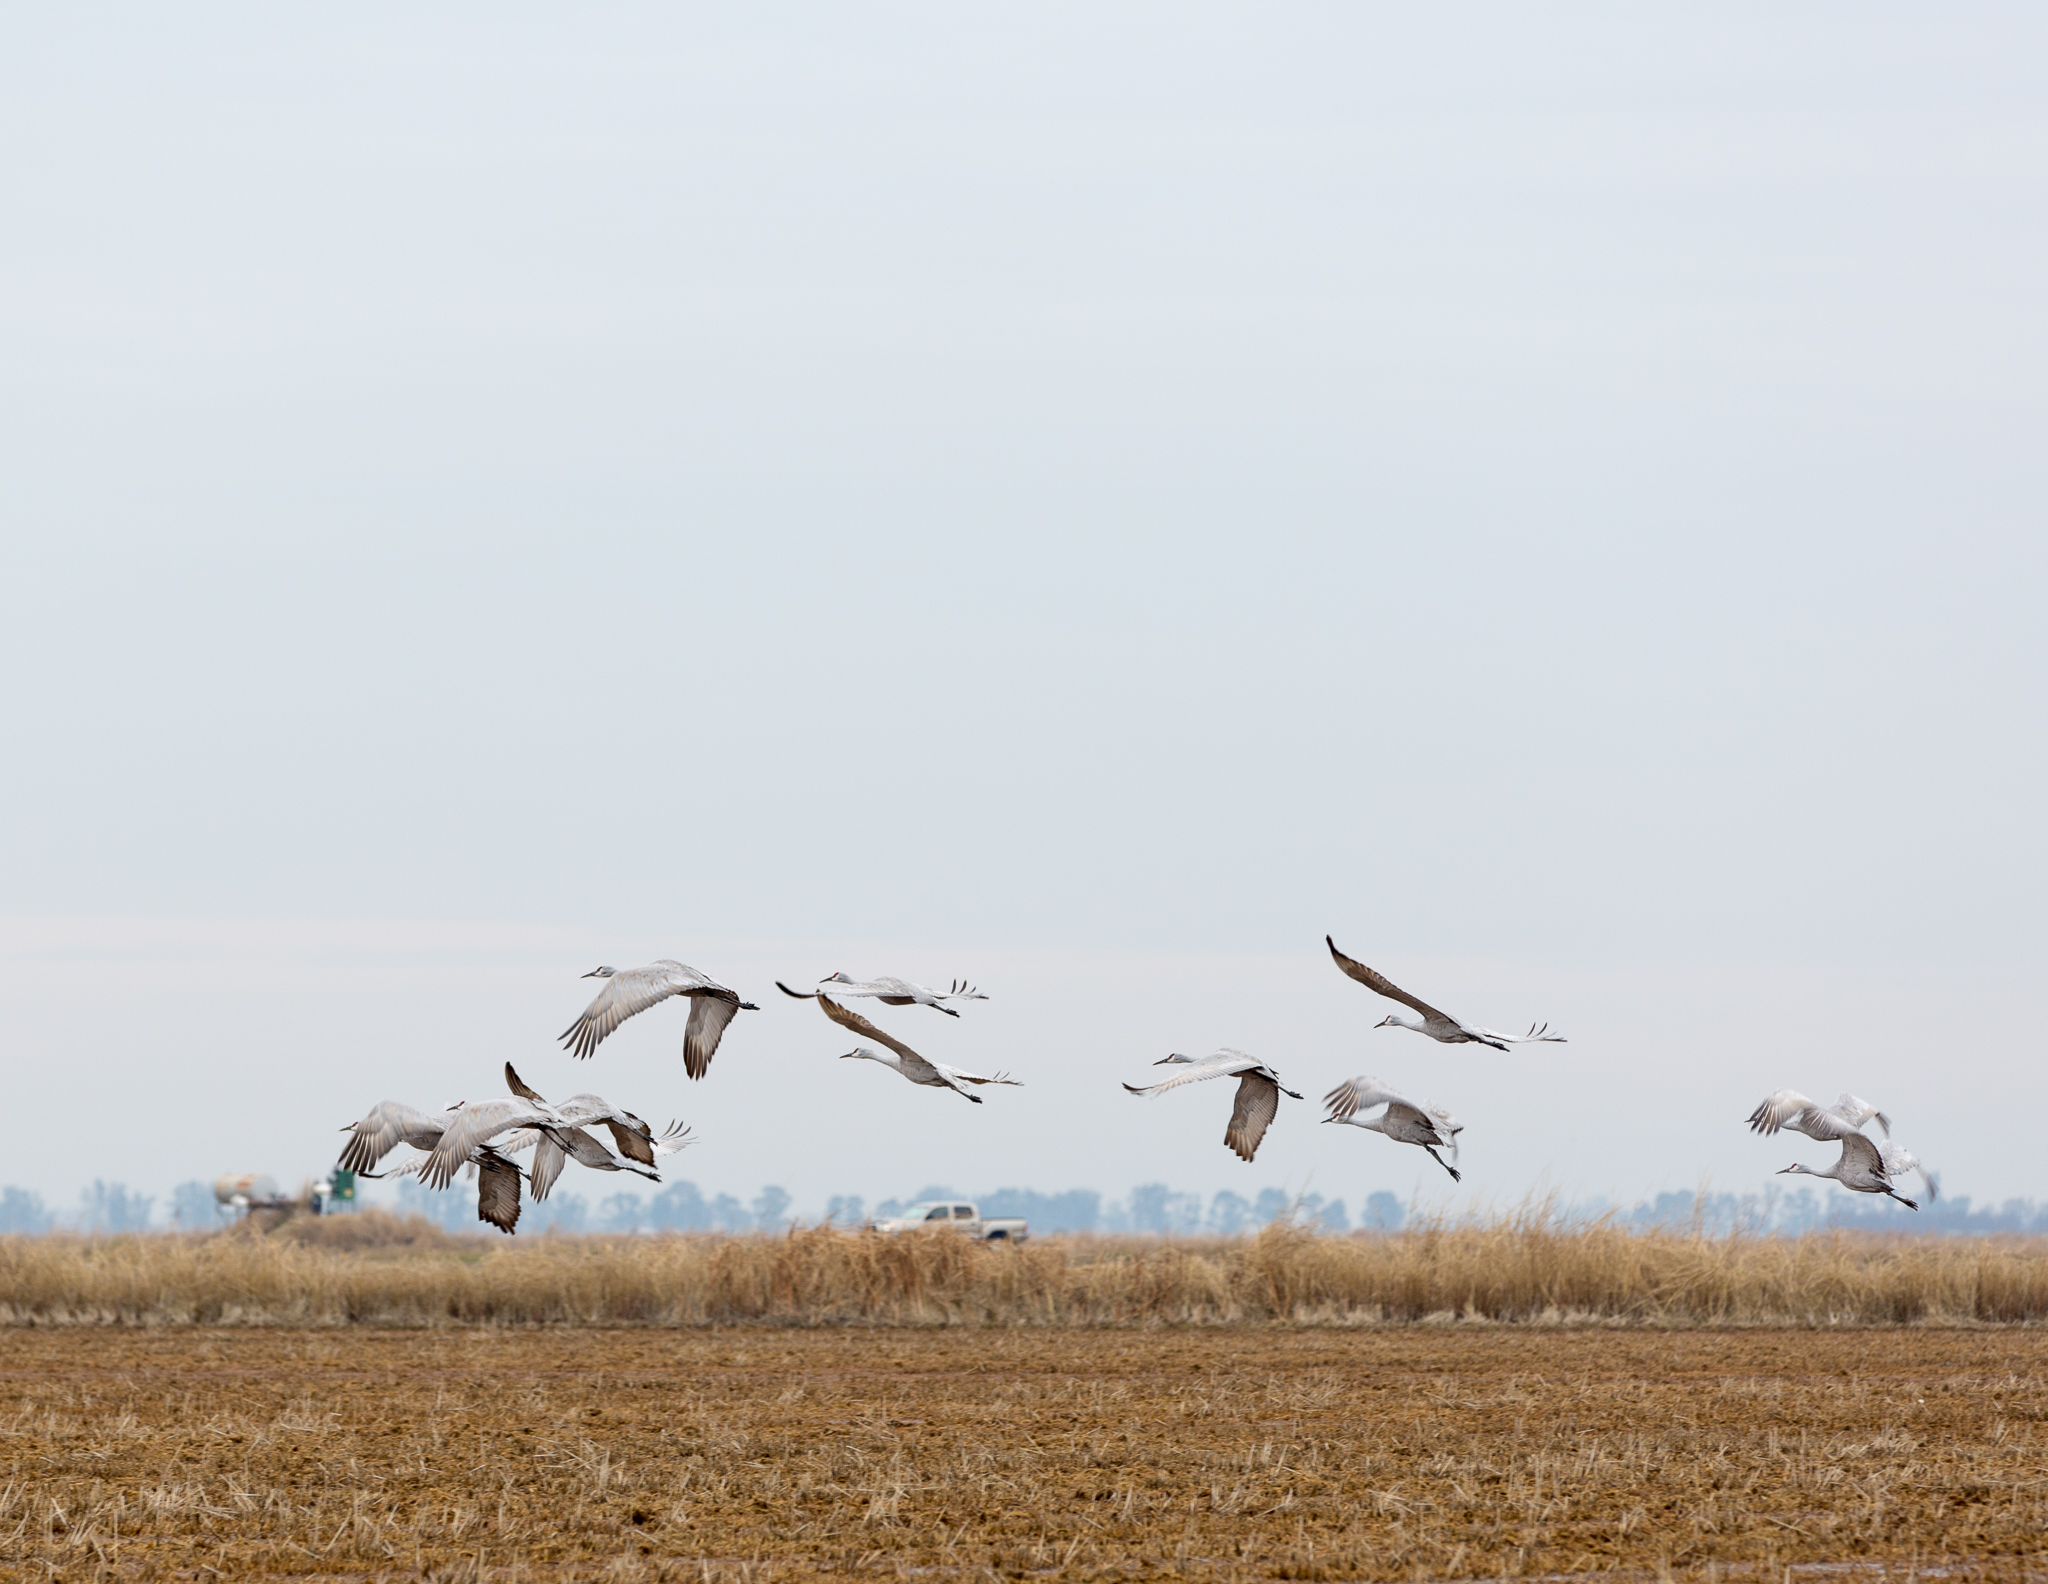 Sandhill cranes lift off over a rice field near Richvale, California.